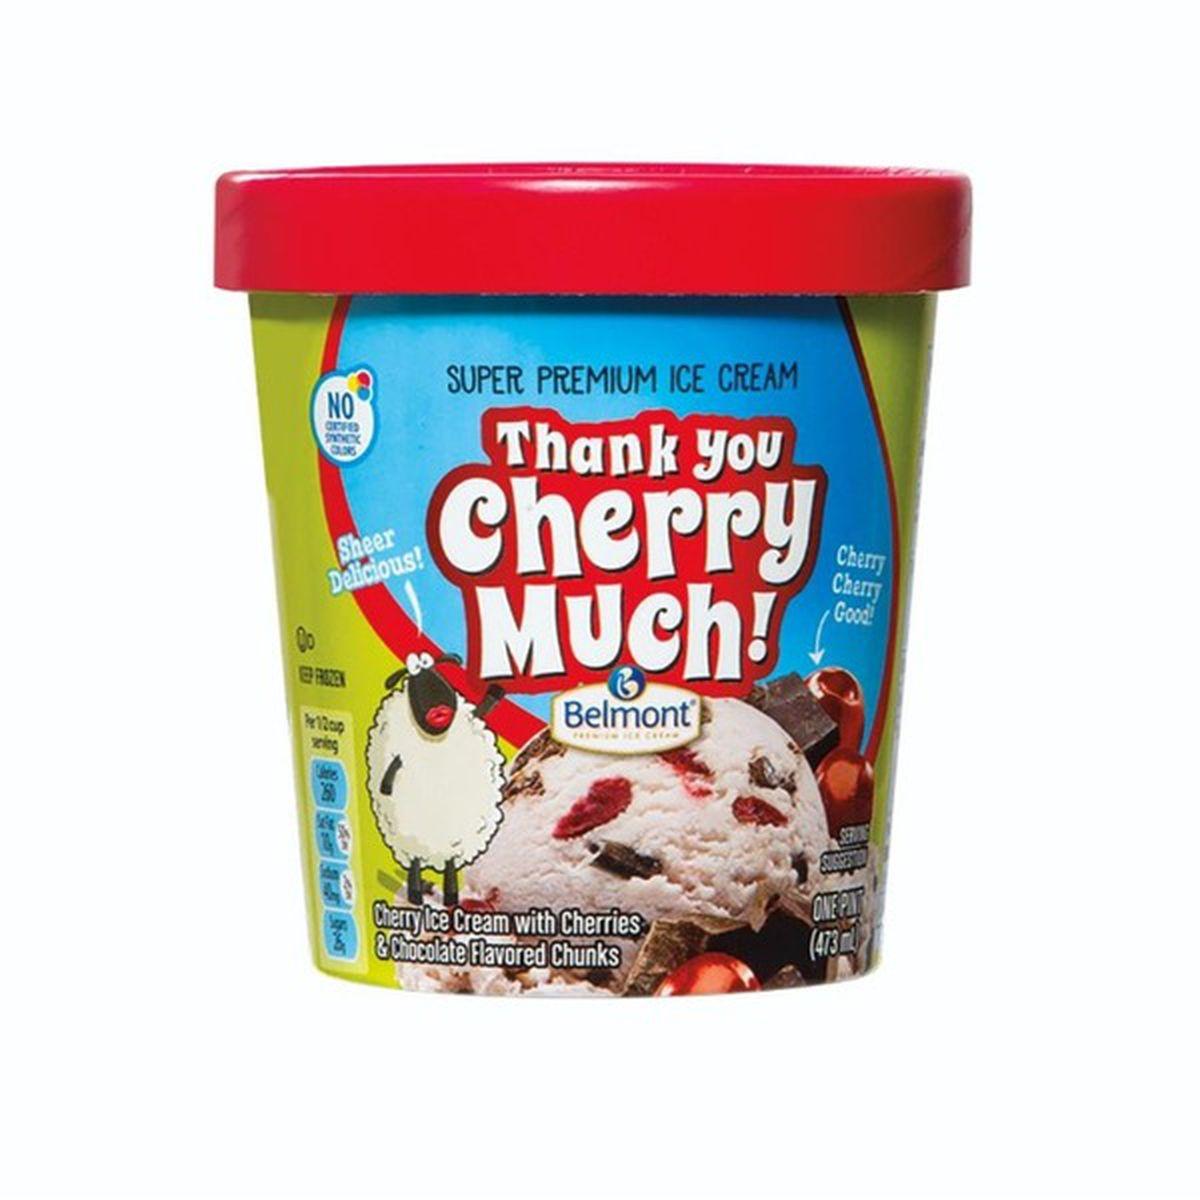 Thank You Cherry Much Premium Ice Cream